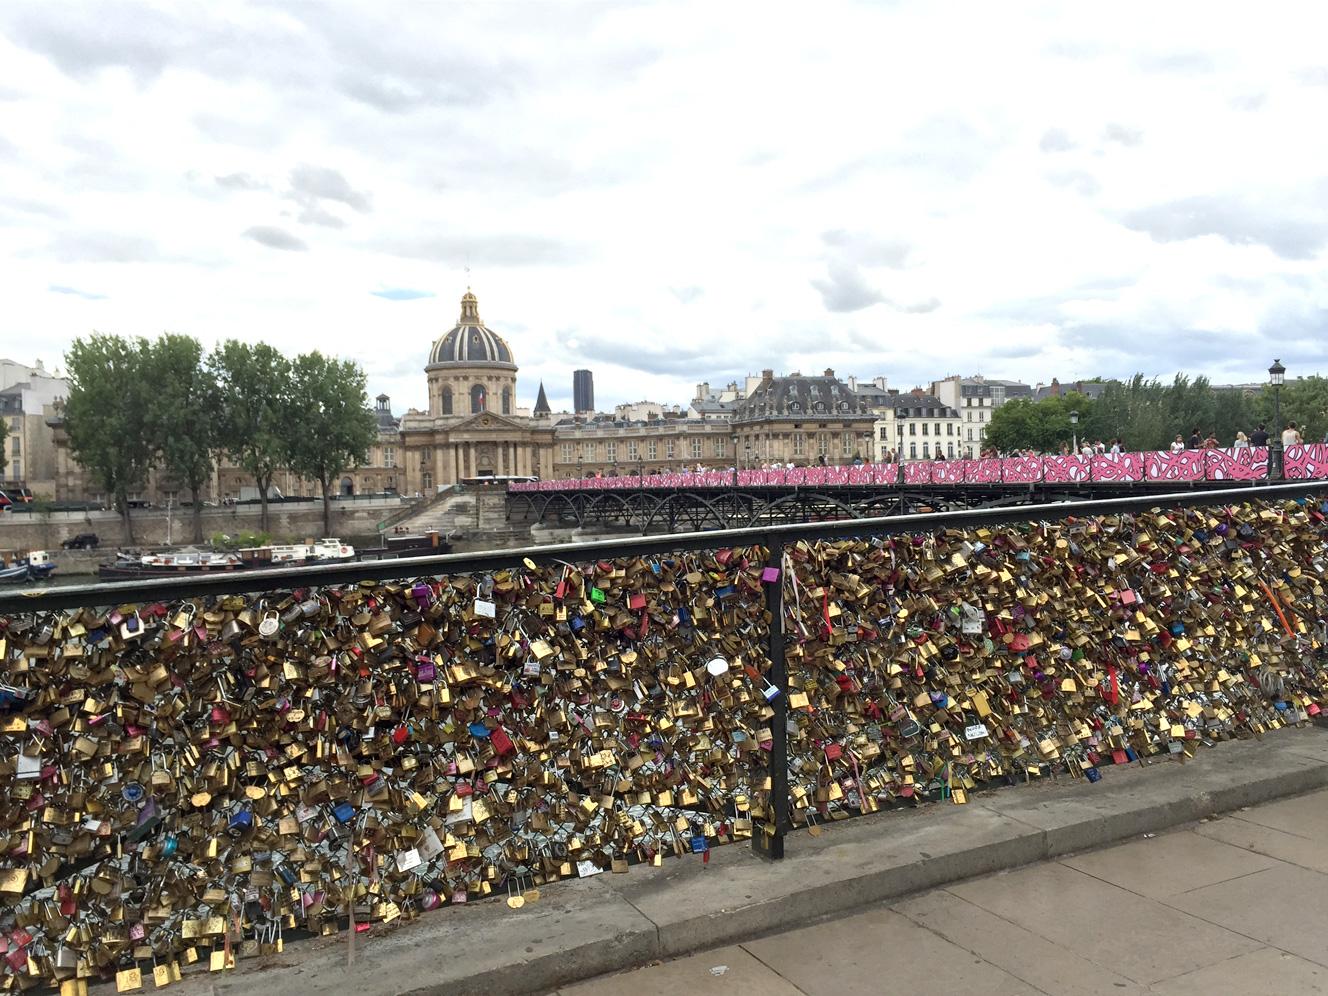 pont_des_arts1